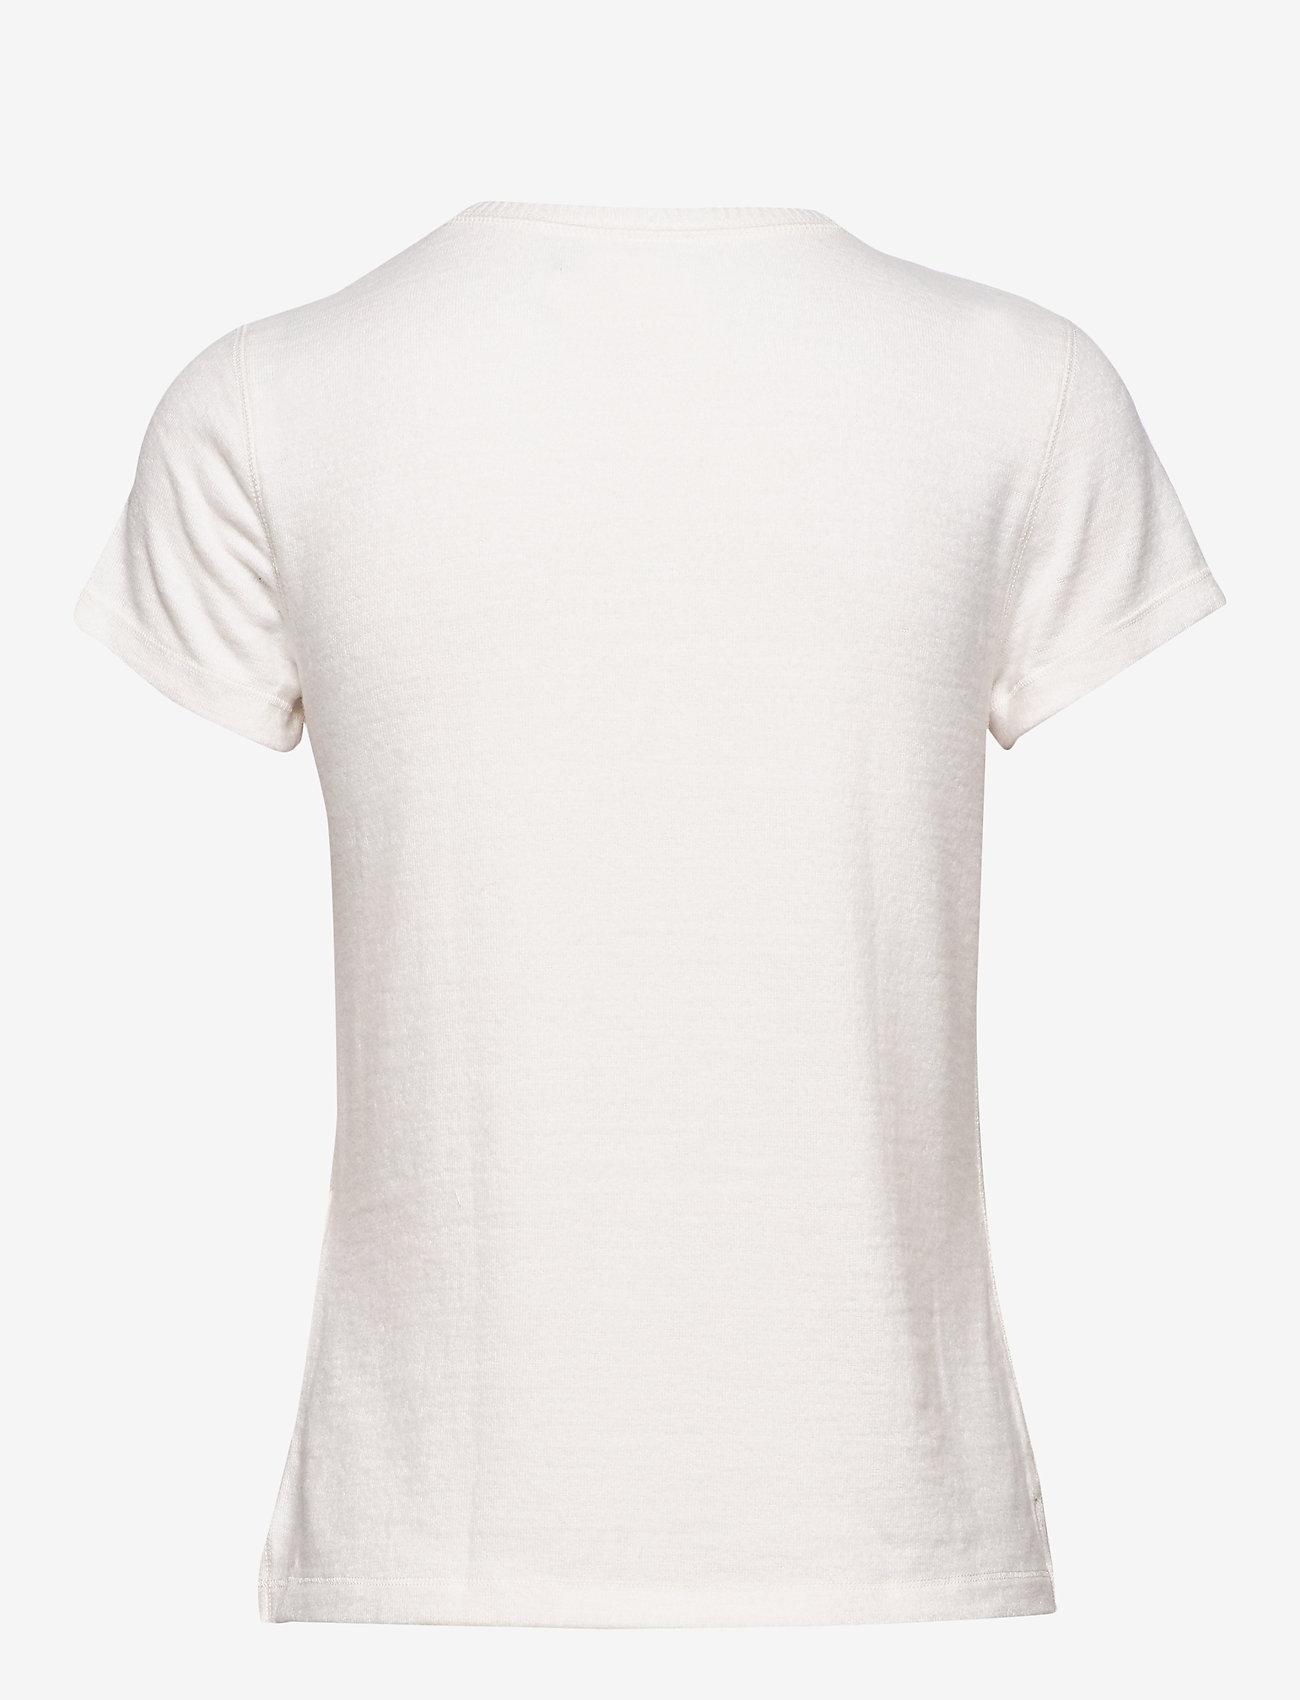 Cozy Logo Tee (White) (314.30 kr) - Abercrombie & Fitch